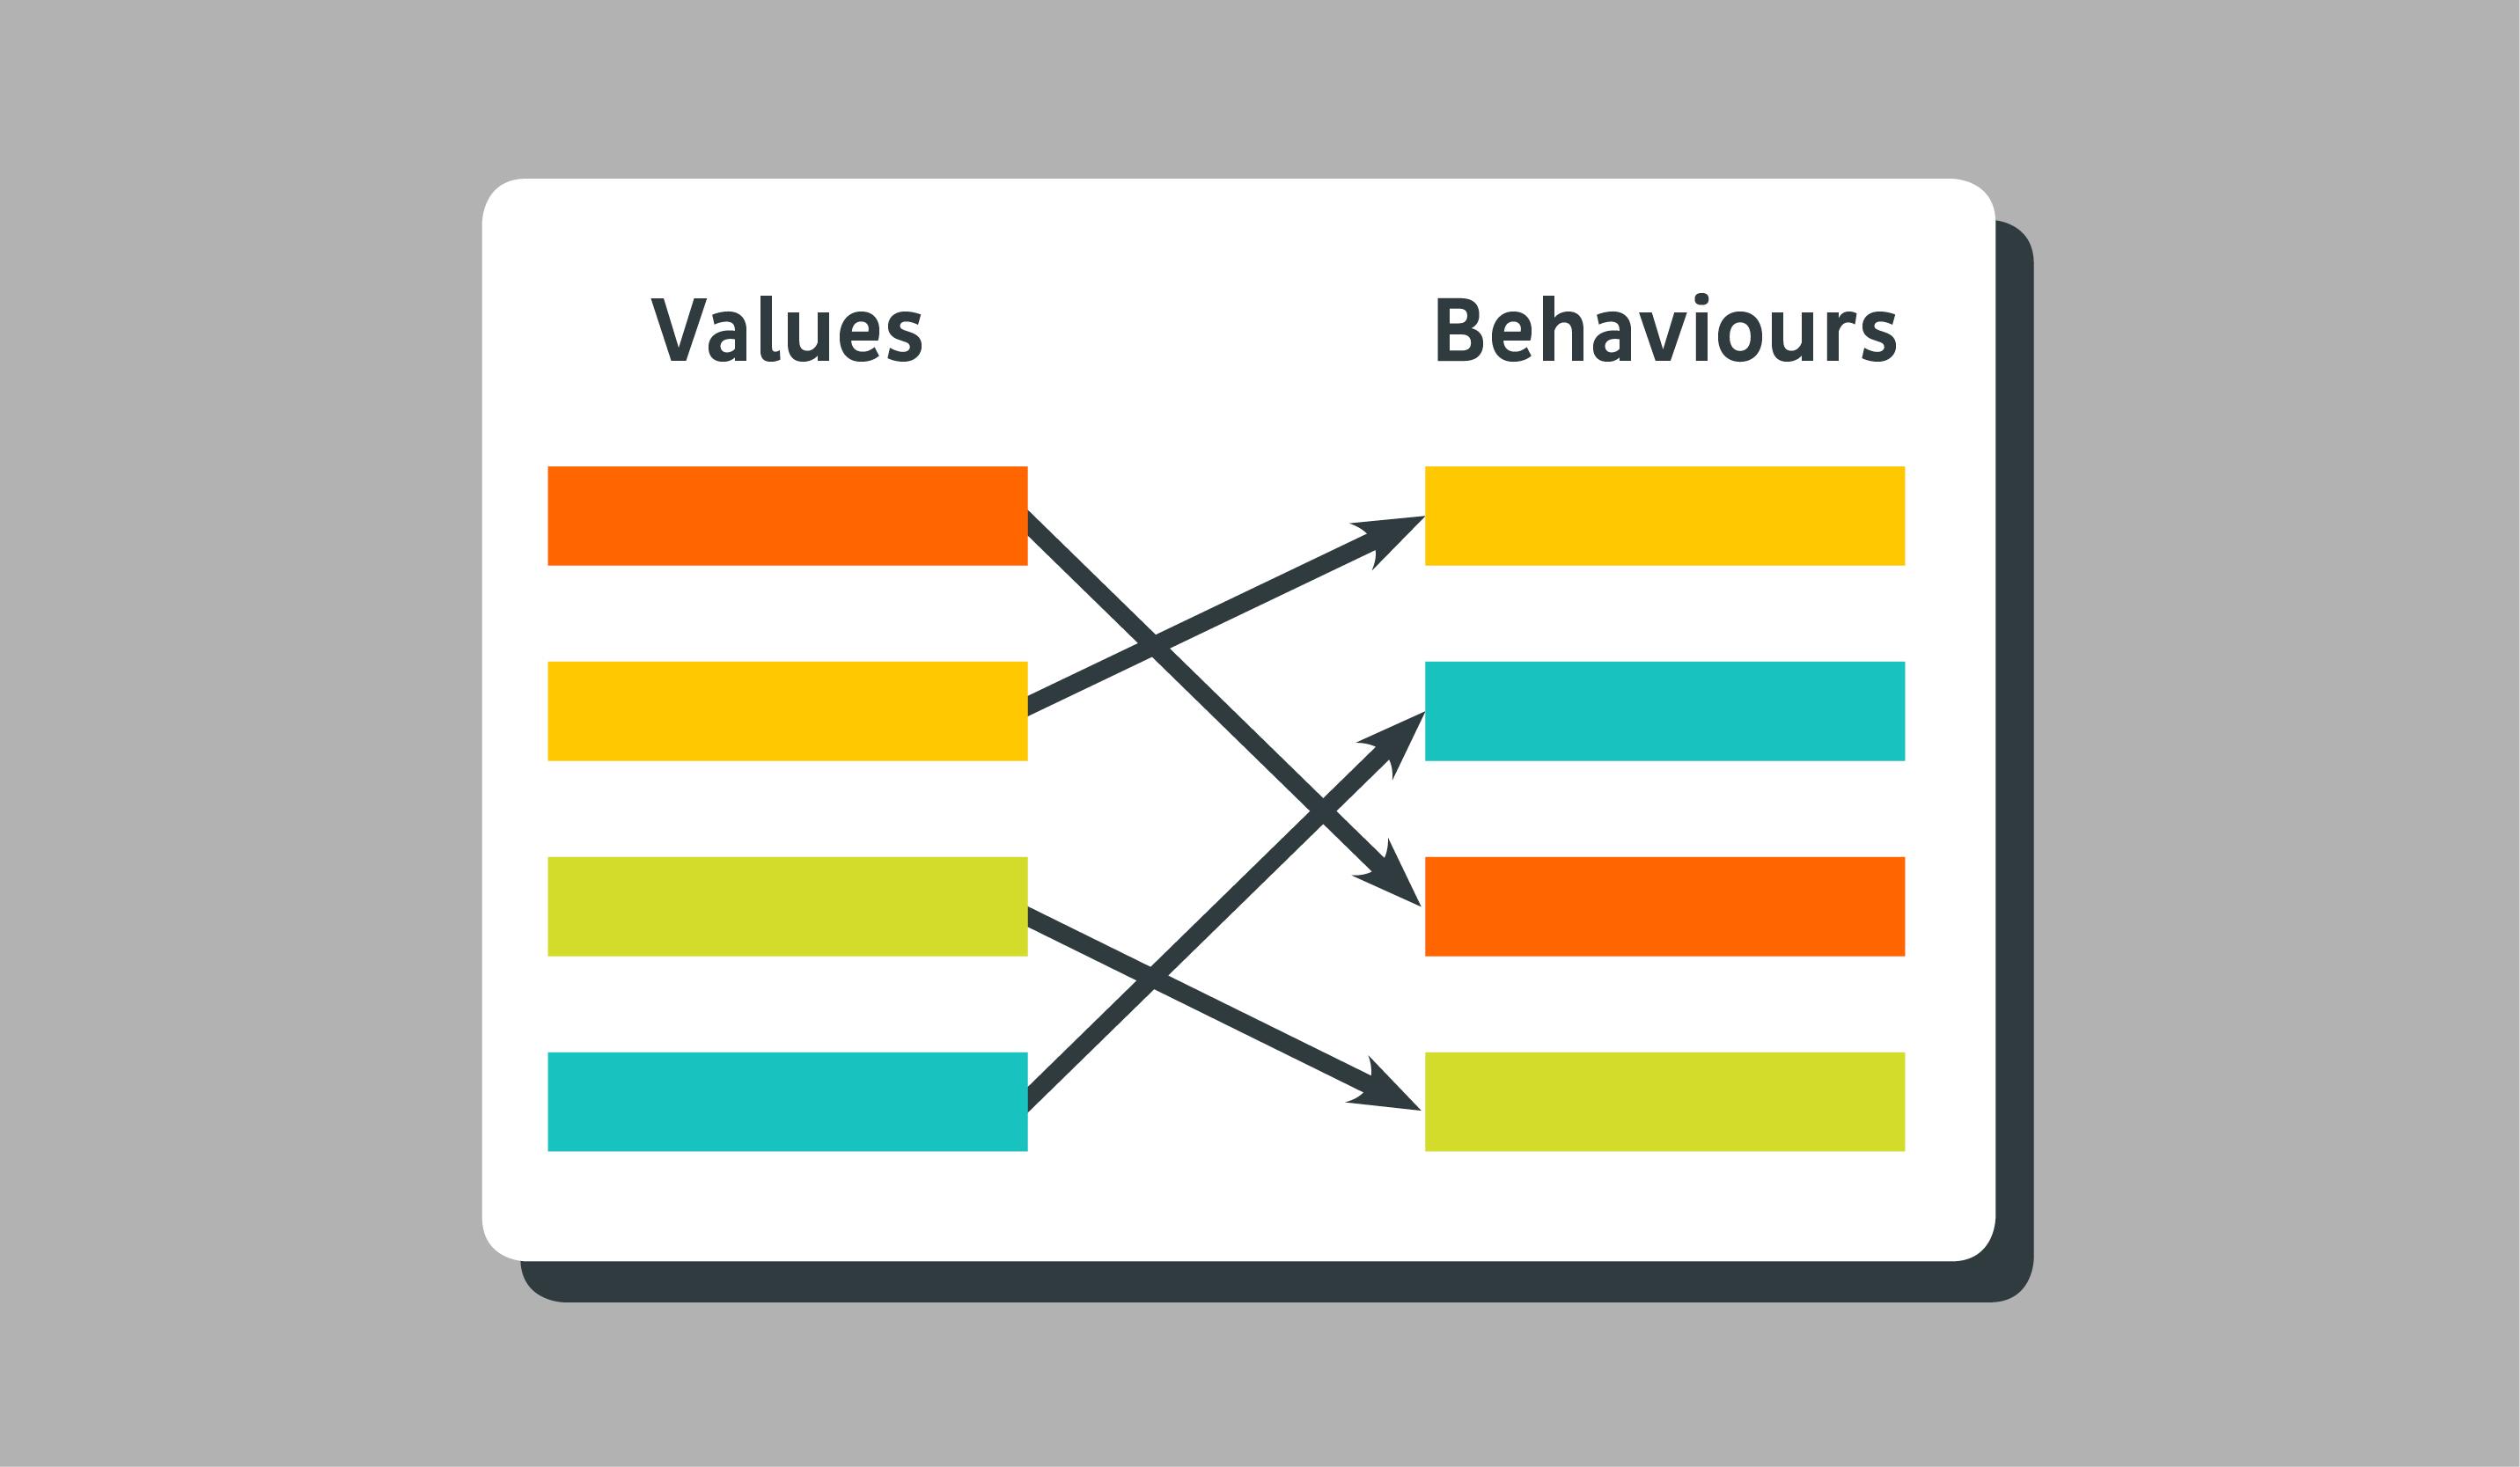 Do your behaviours match your values?